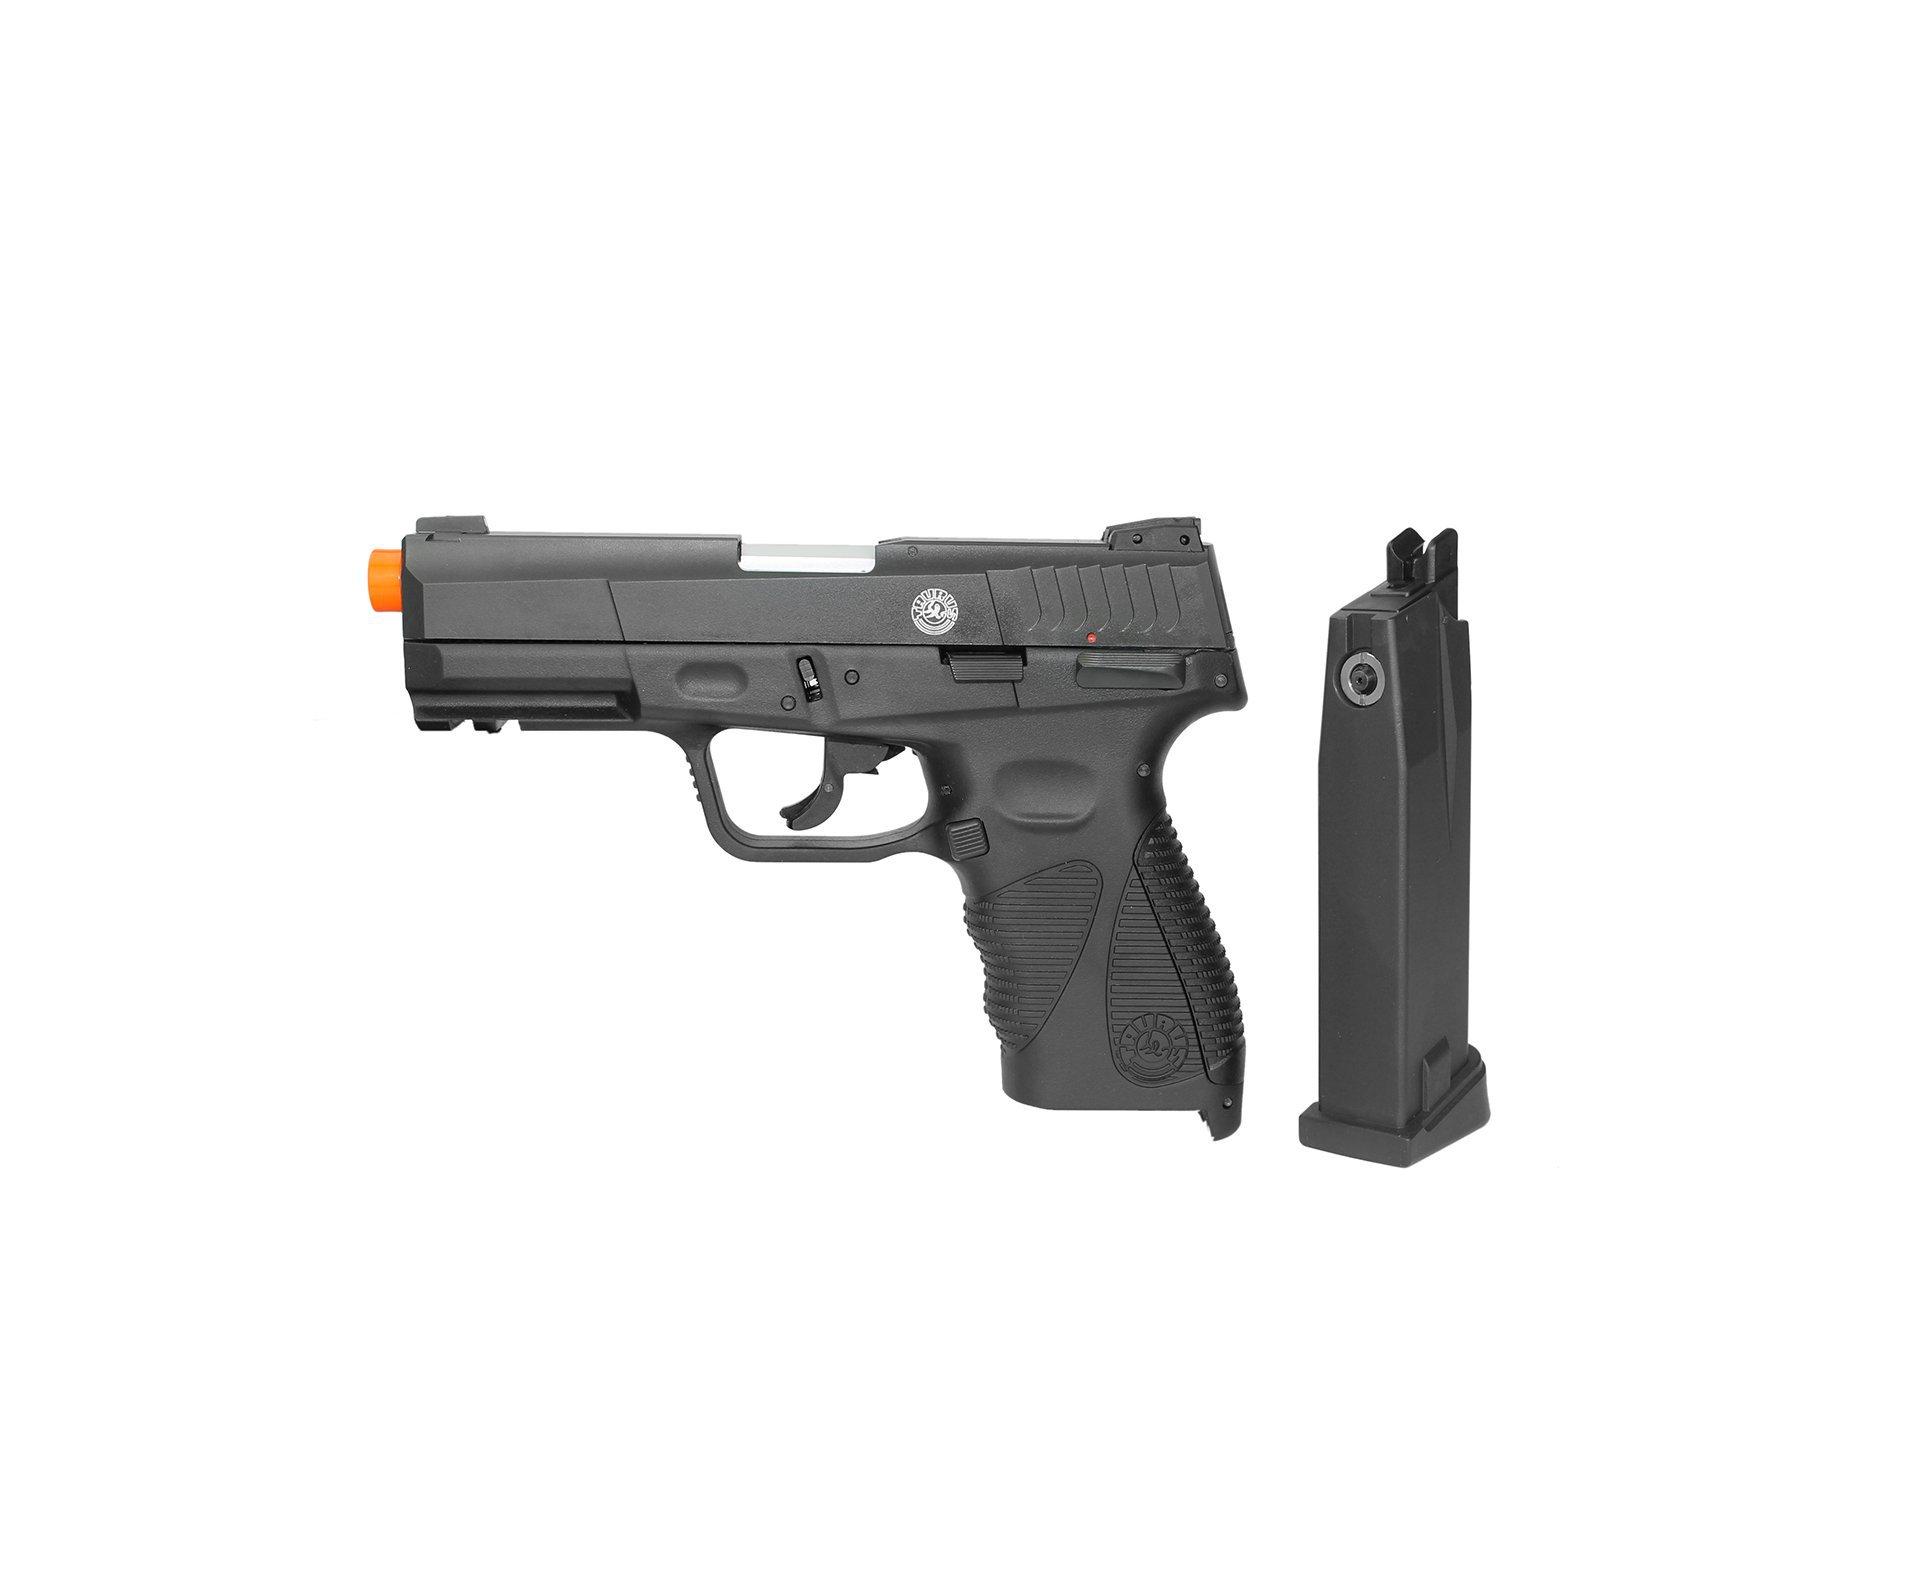 Pistola De Airsoft Gas Co2 Taurus Pt 24/7 G2 Blowback Preta 6mm